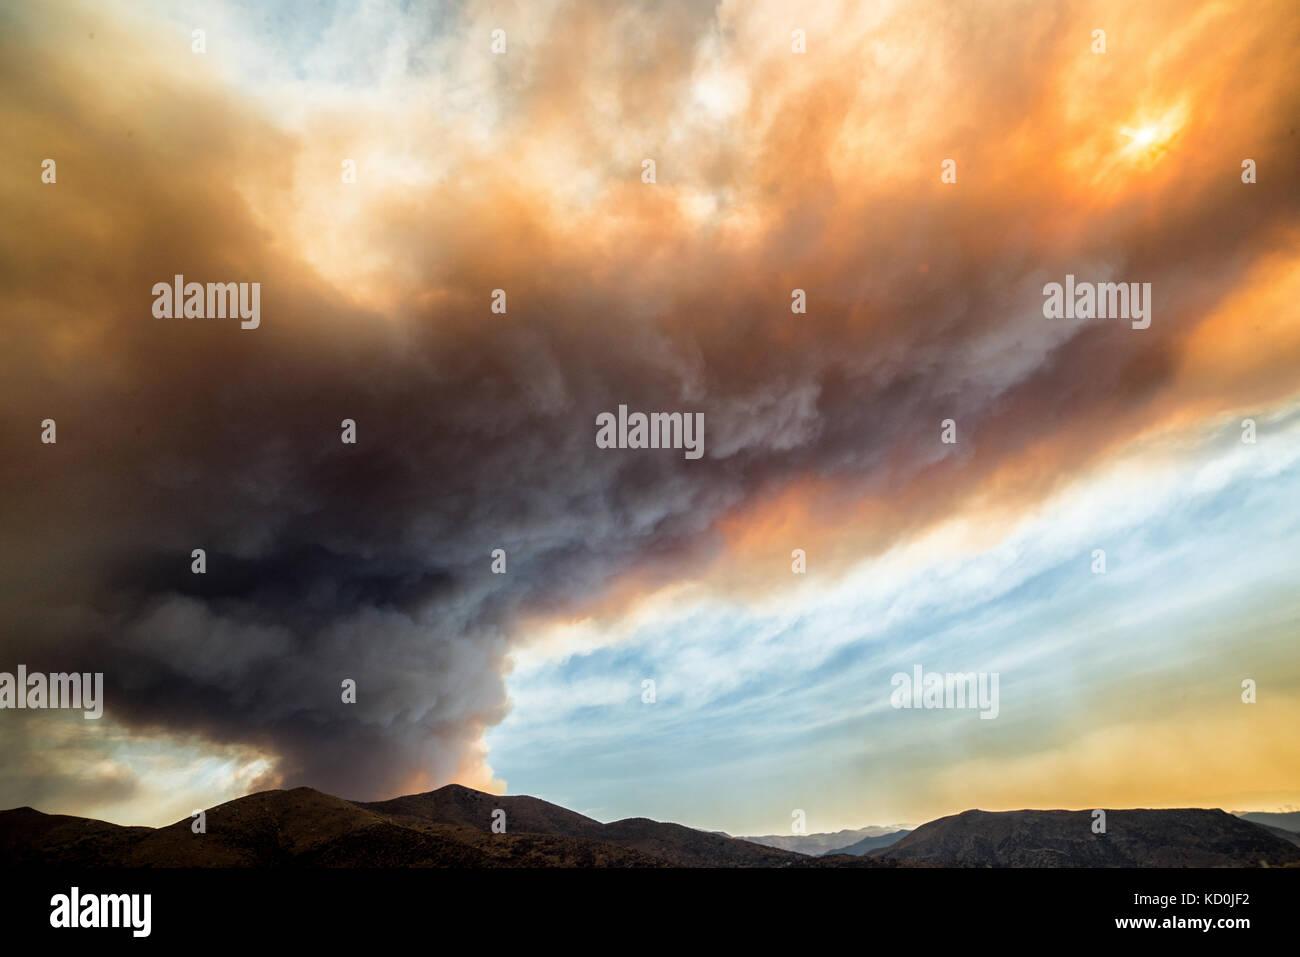 Santa Clarita Stock Photos & Santa Clarita Stock Images - Alamy